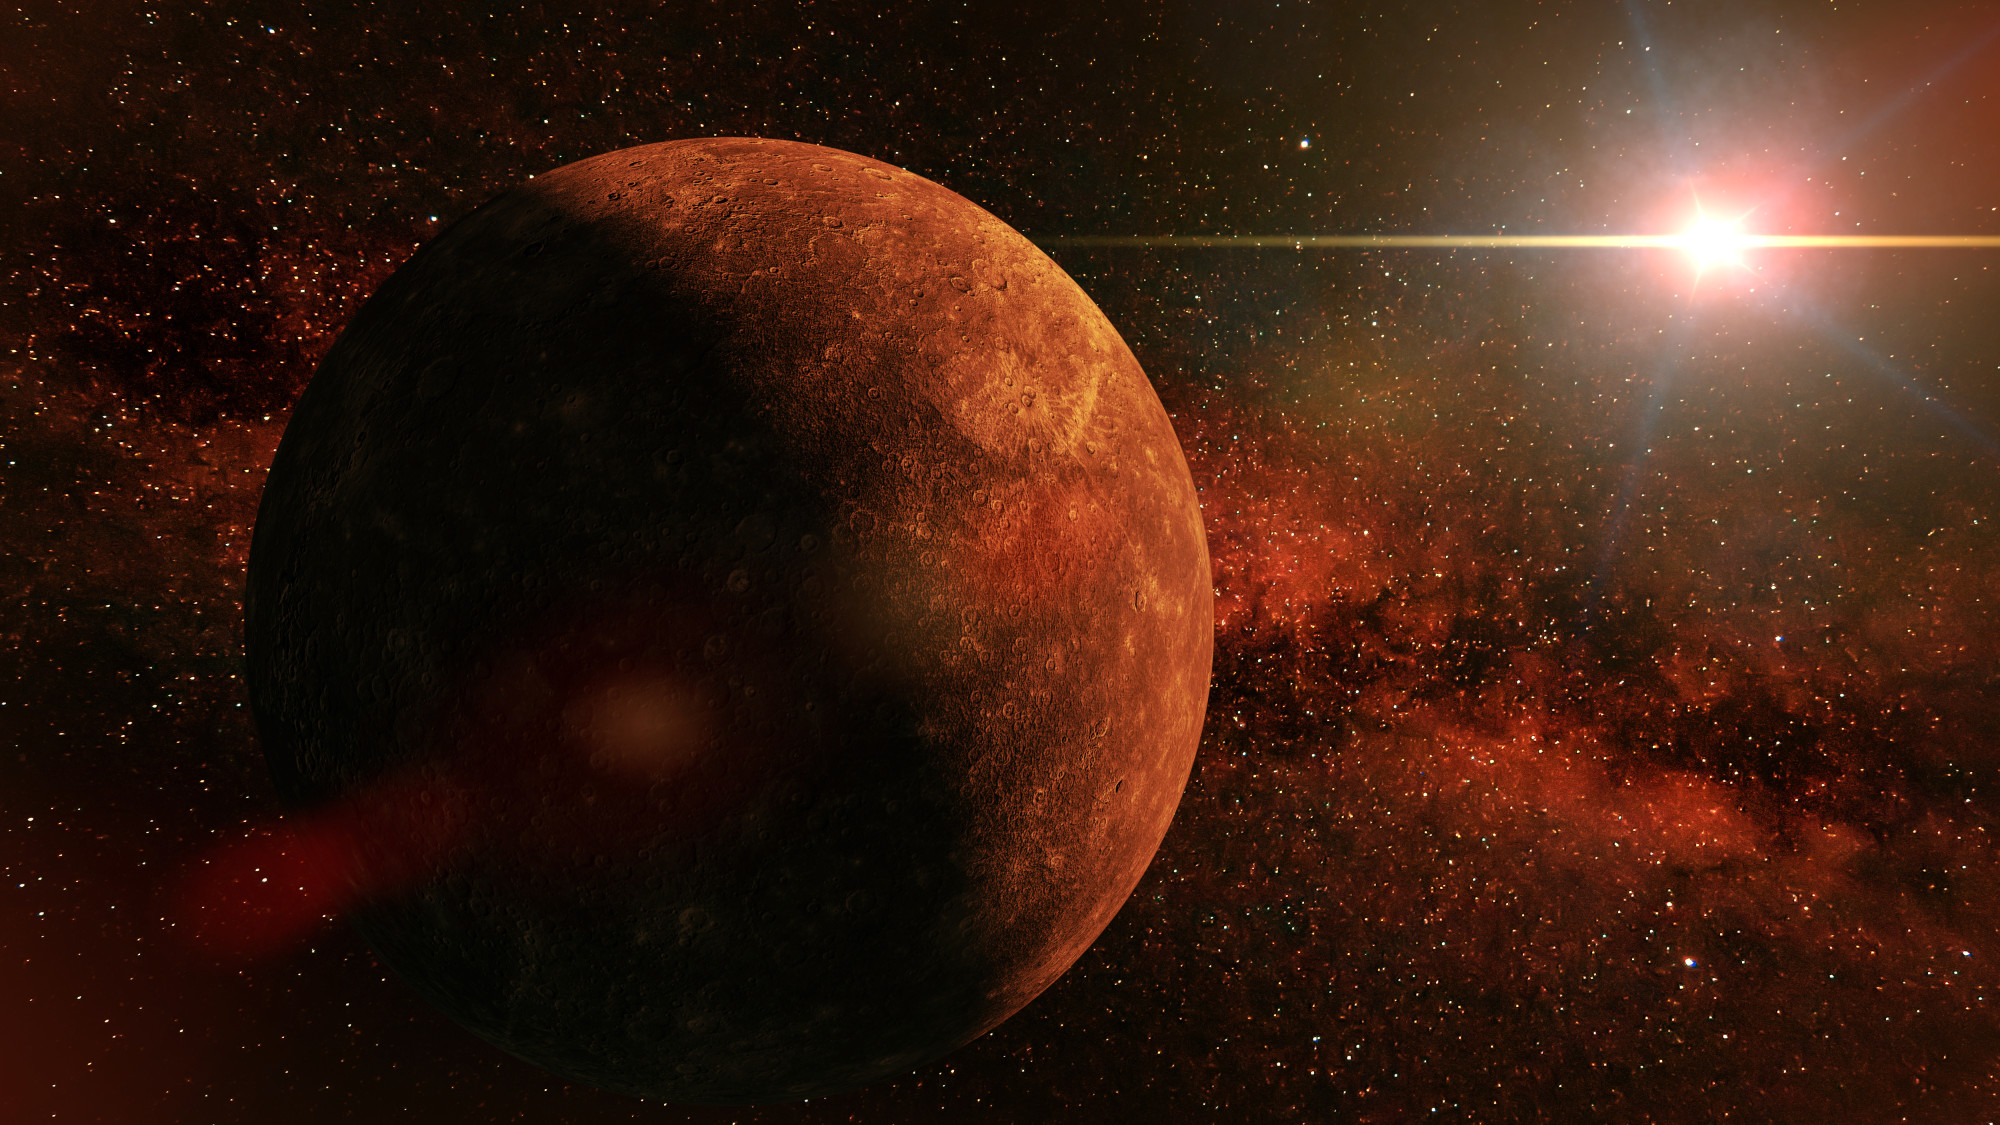 Things Feeling Off? 9 Signs It's Mercury in Retrograde